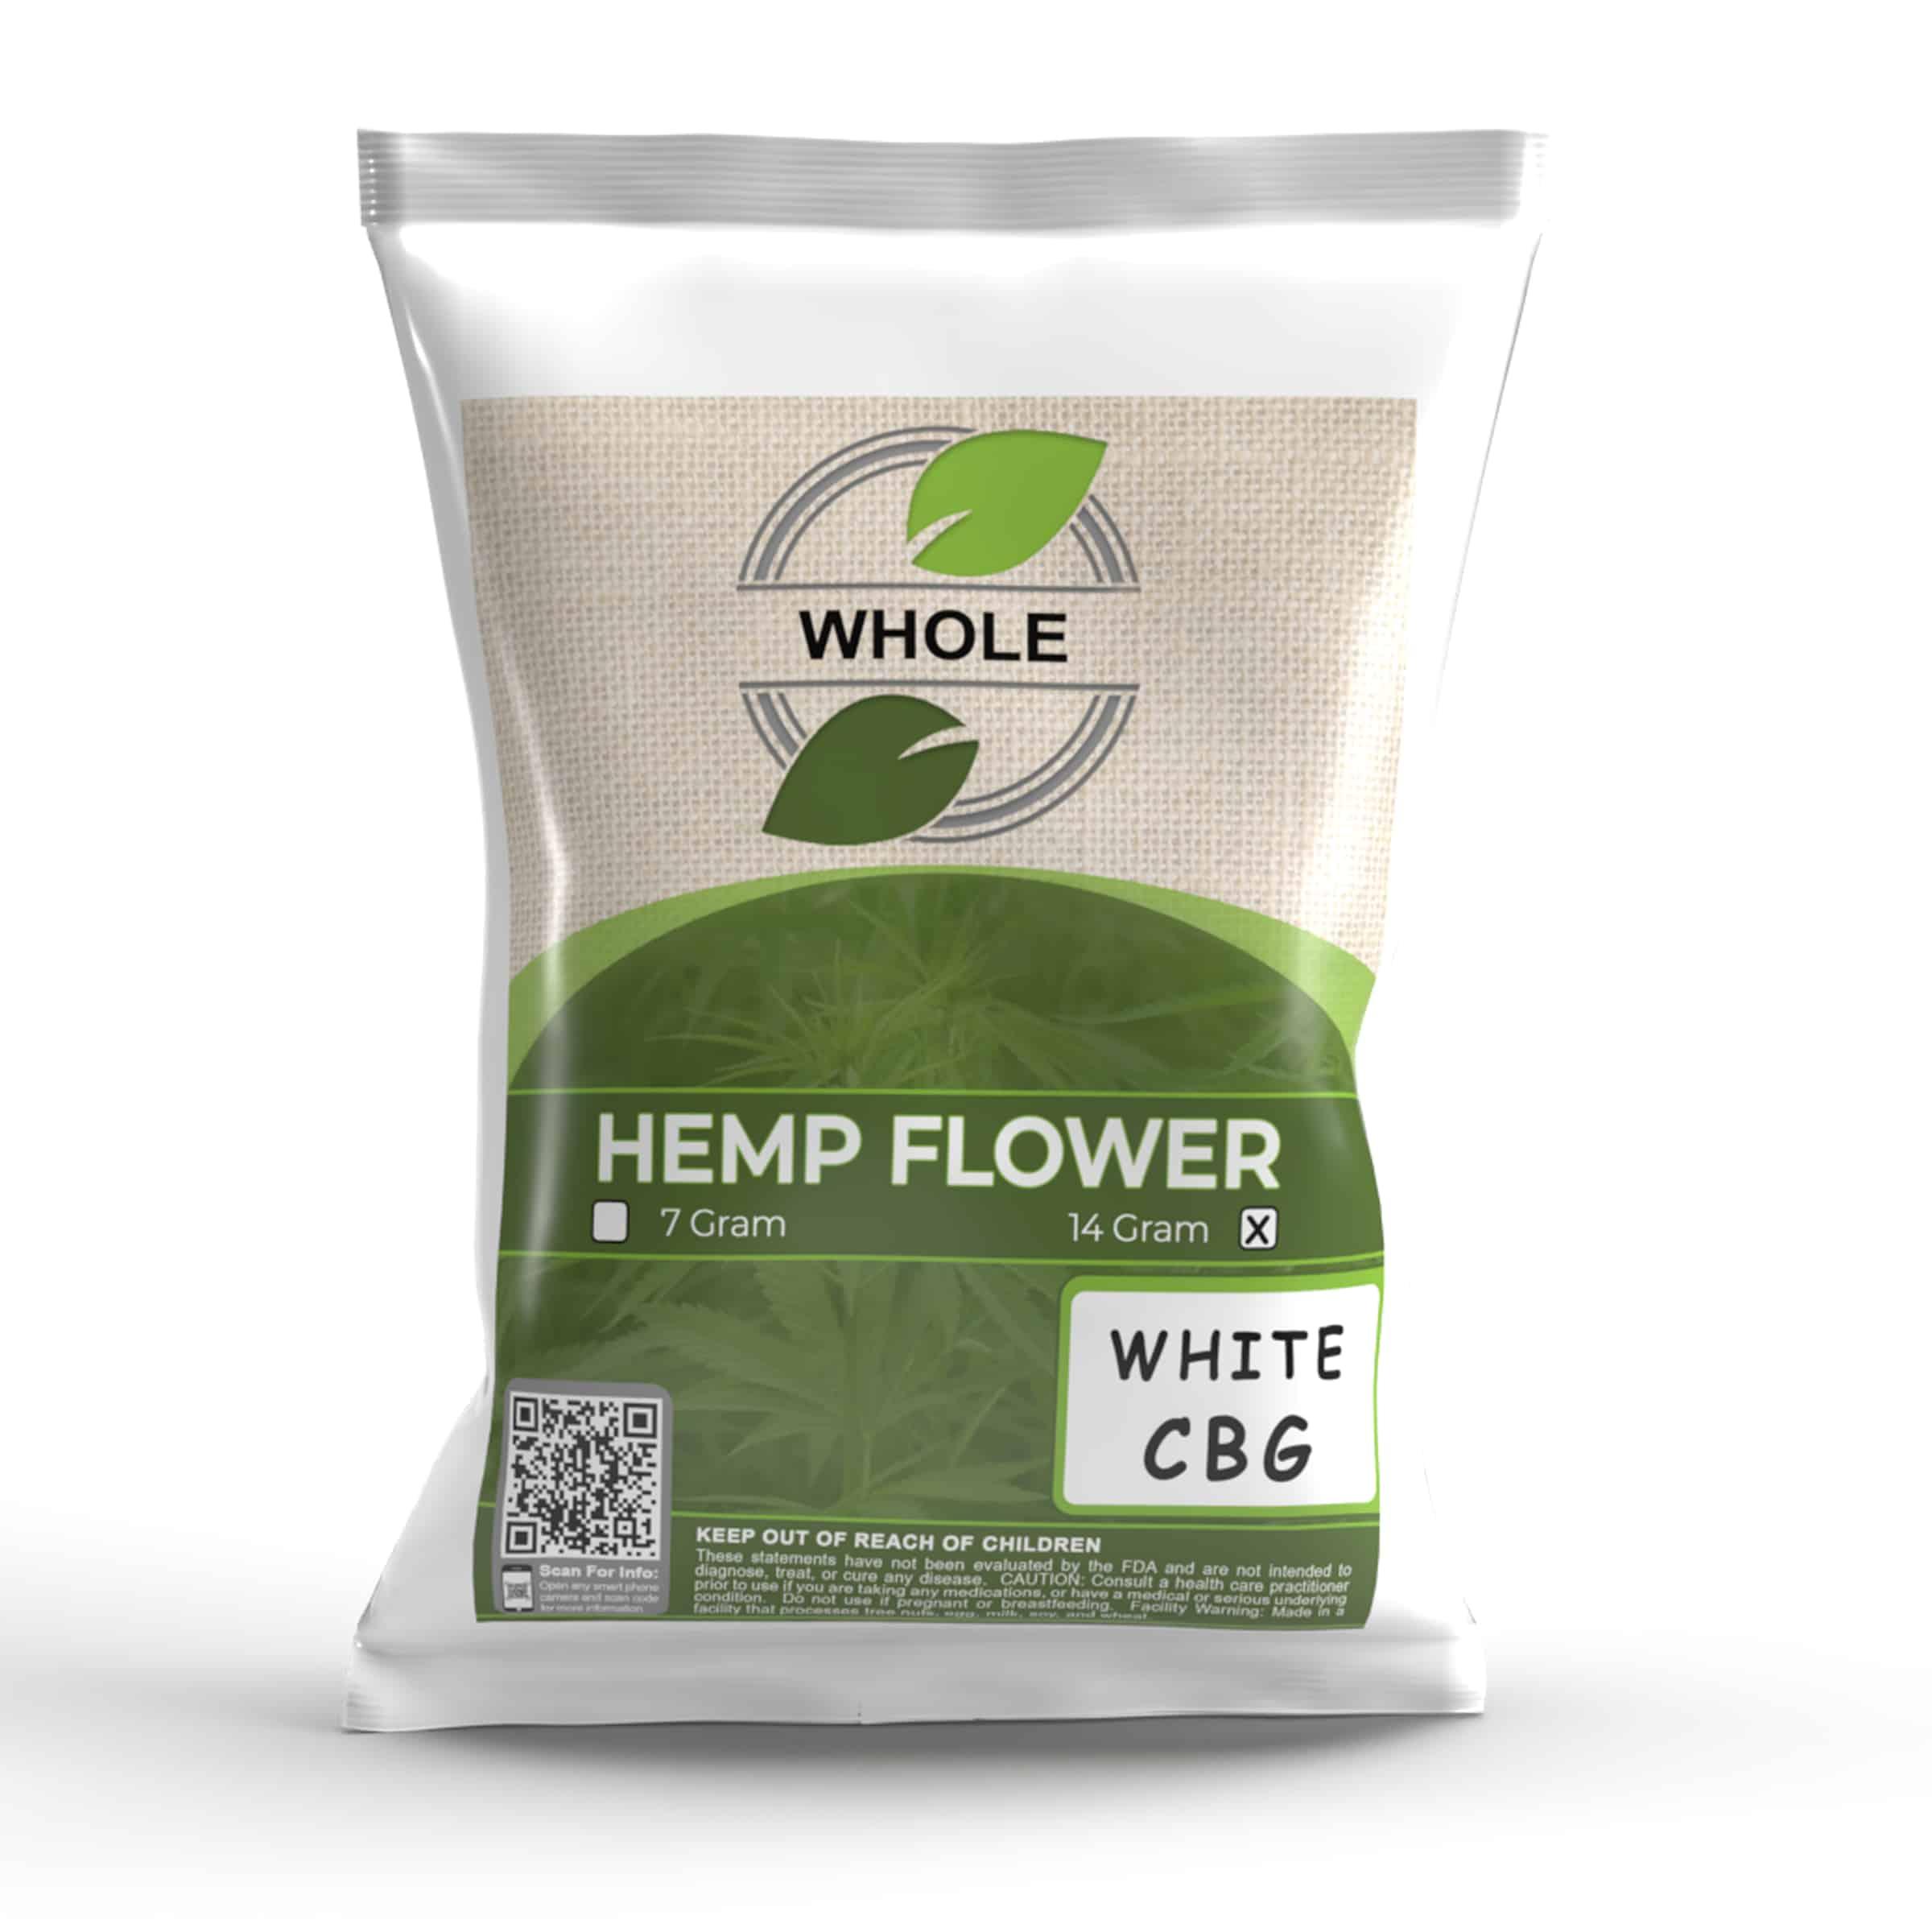 WHOLE-CBG-HEMP-FLOWER-14-GRAM